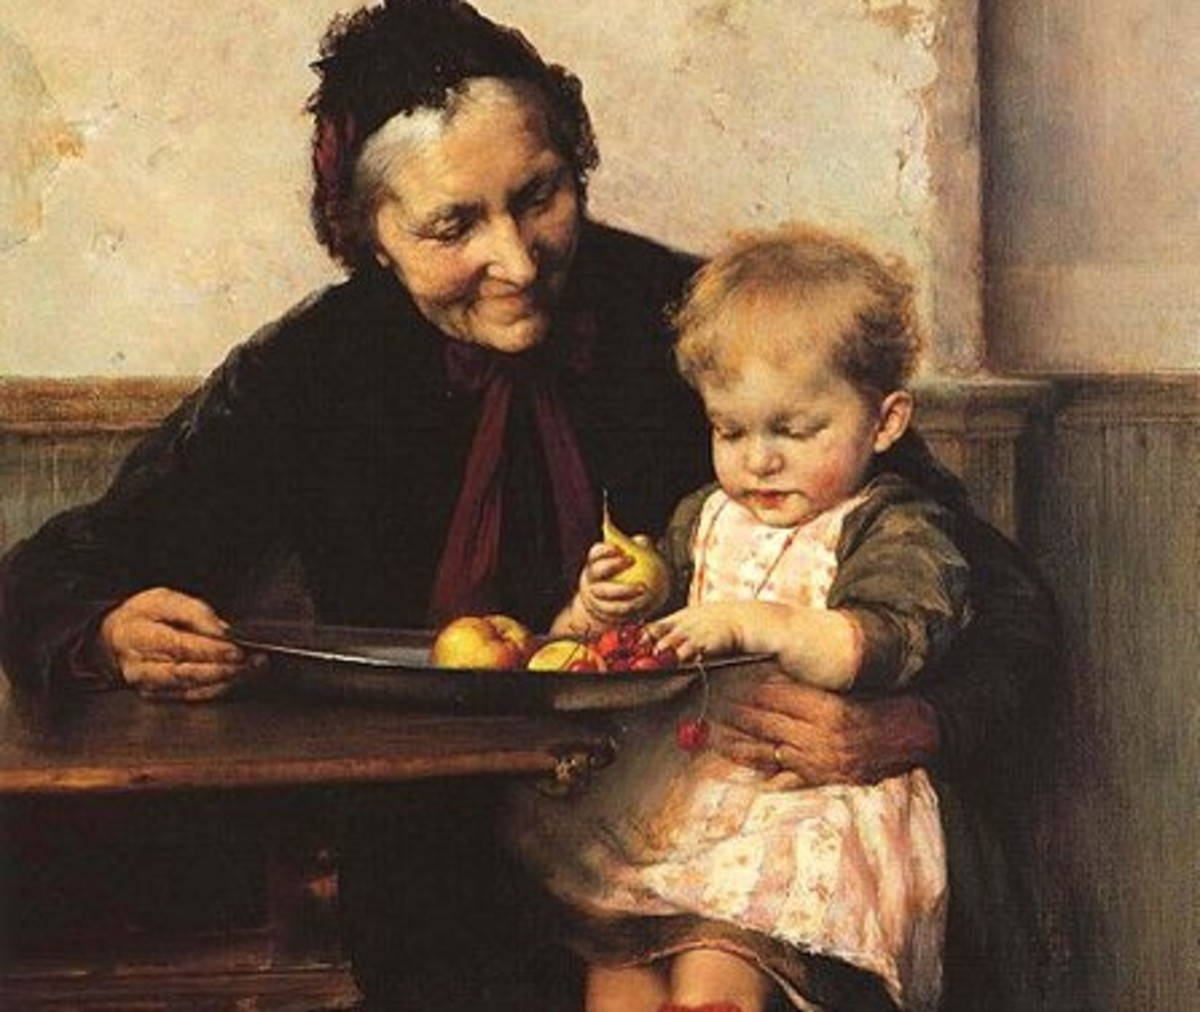 """Grandma's Favorite.""  Painting by Georgios Jakobides (1853-1932)."